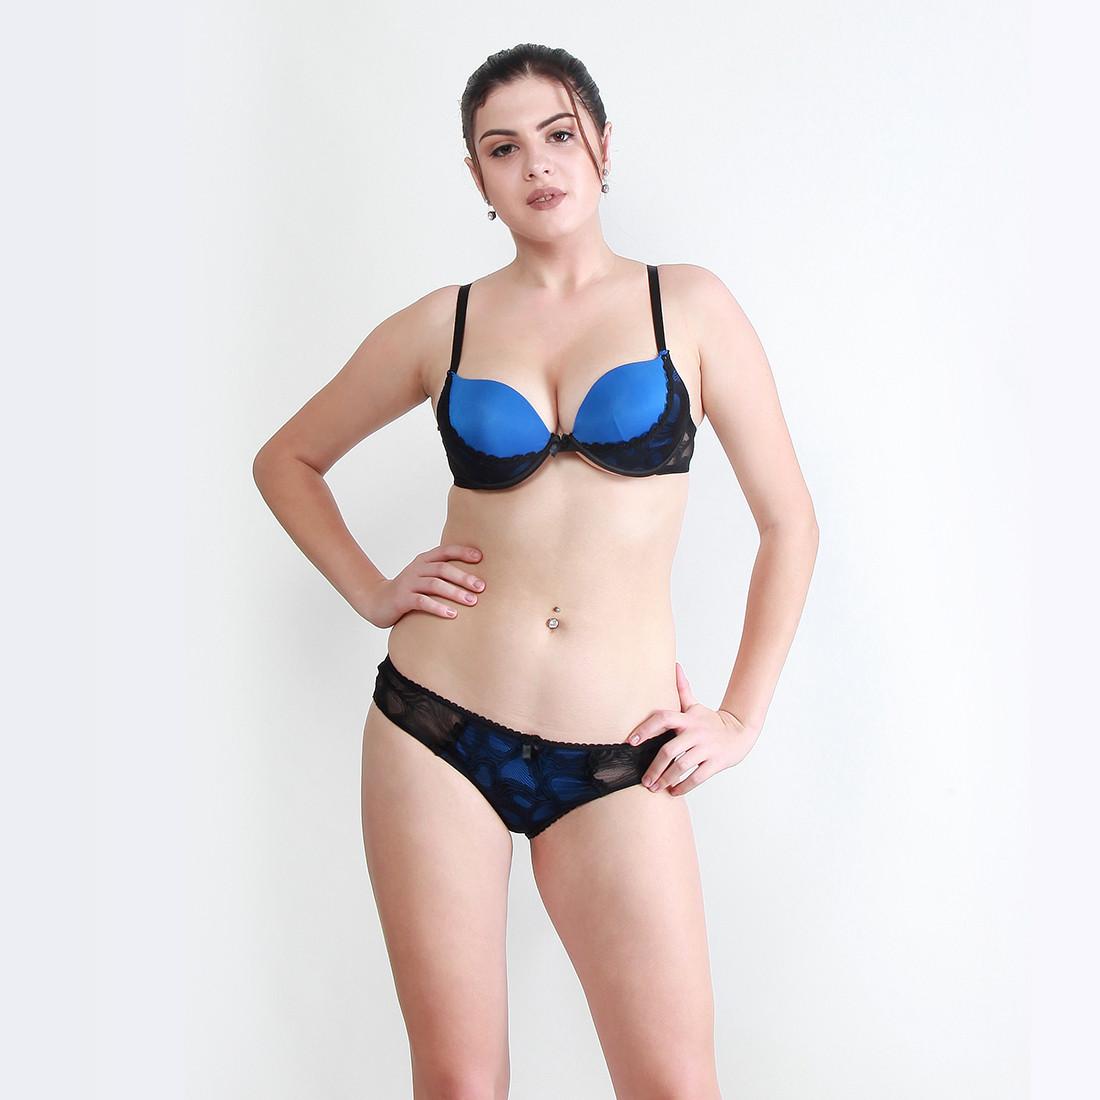 Makclan Zesty Tango 2Tone Aegean Azure Blue Lingerie Set